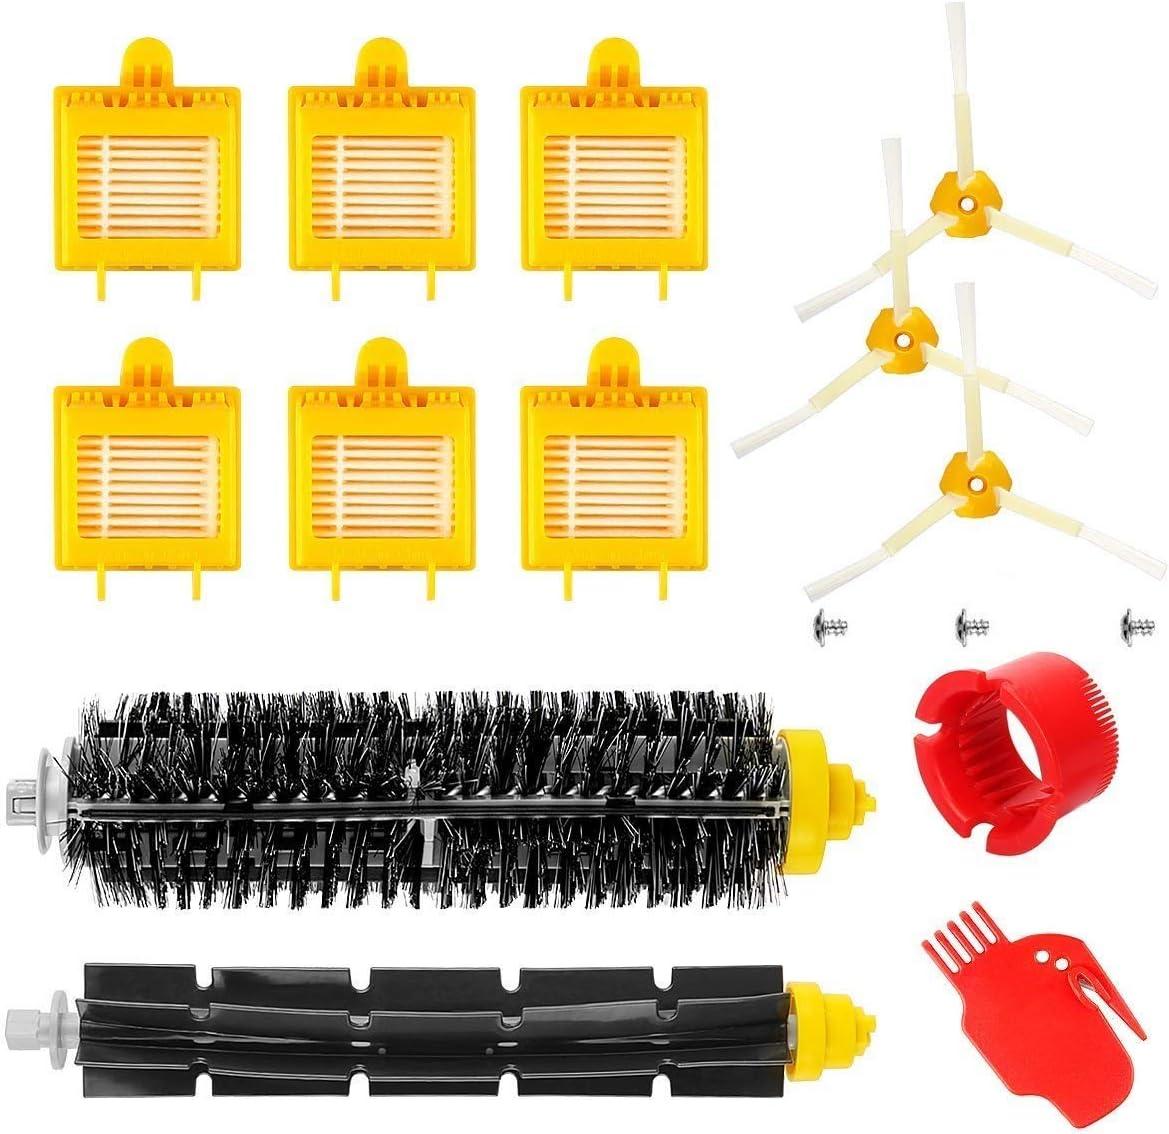 MAXDIRECT Pack Kit de 13 PCS de Accesorios y Recambios Roomba Serie 700 (Cepillos, Cerdas, Filtros y Brush) para Aspiradoras iRobot Roomba Serie 700.: Amazon.es: Hogar